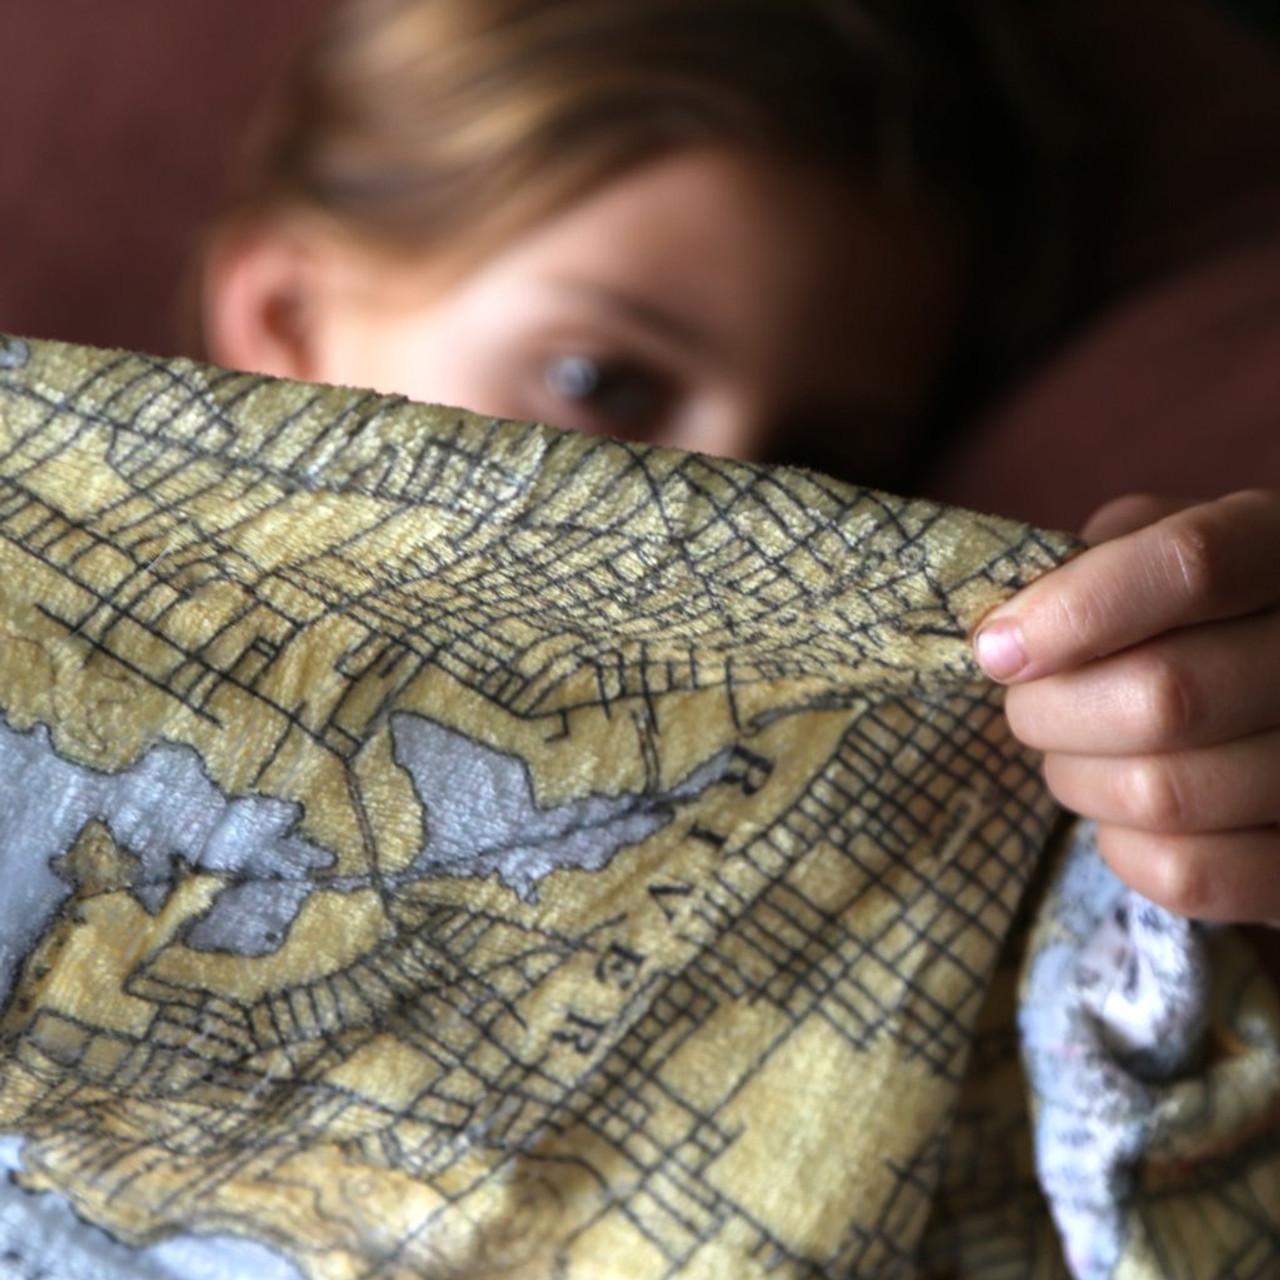 Nautical Blanket - Annapolis and Chesapeake Bay, MD/VA